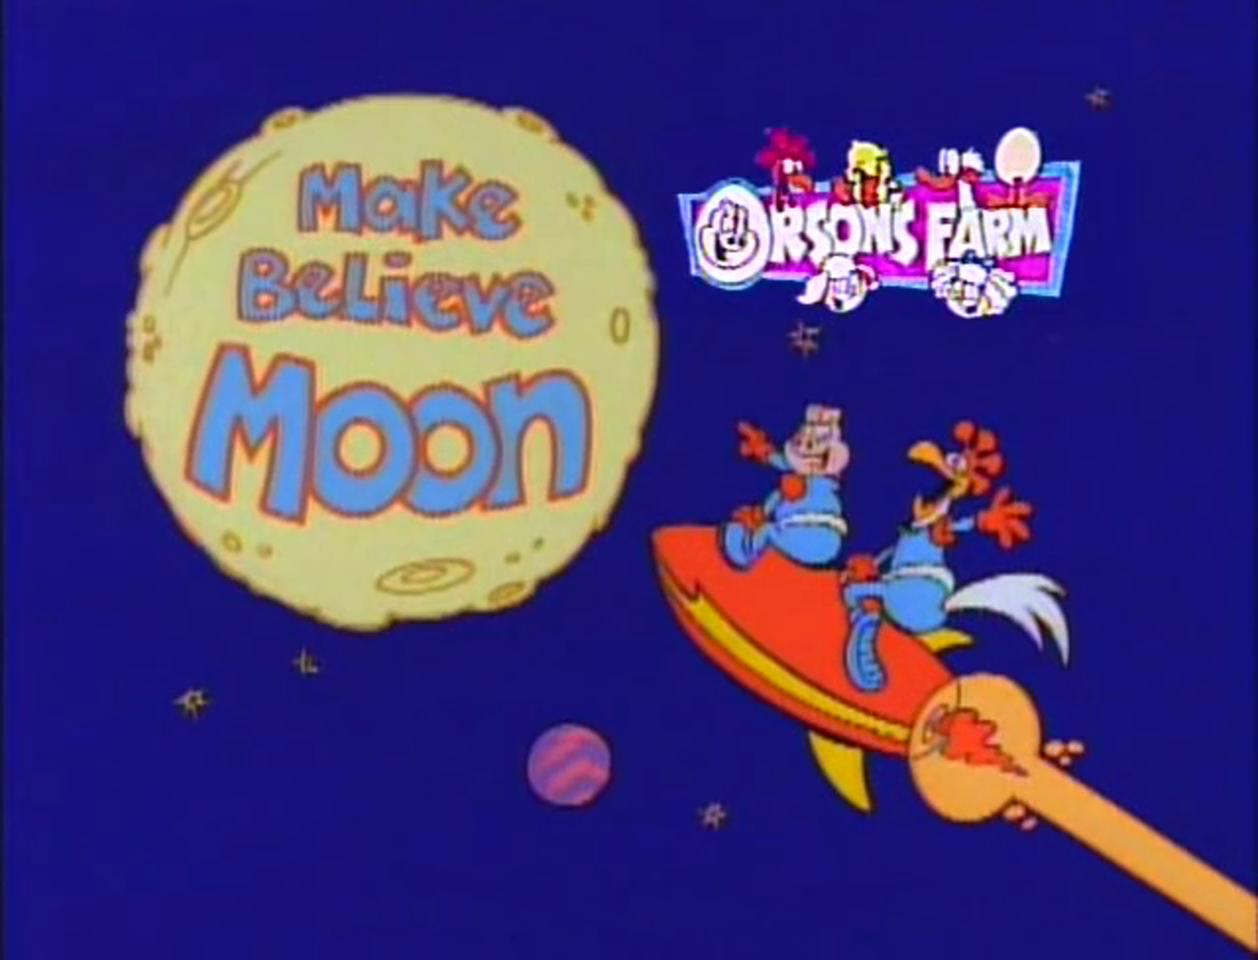 Make Believe Moon